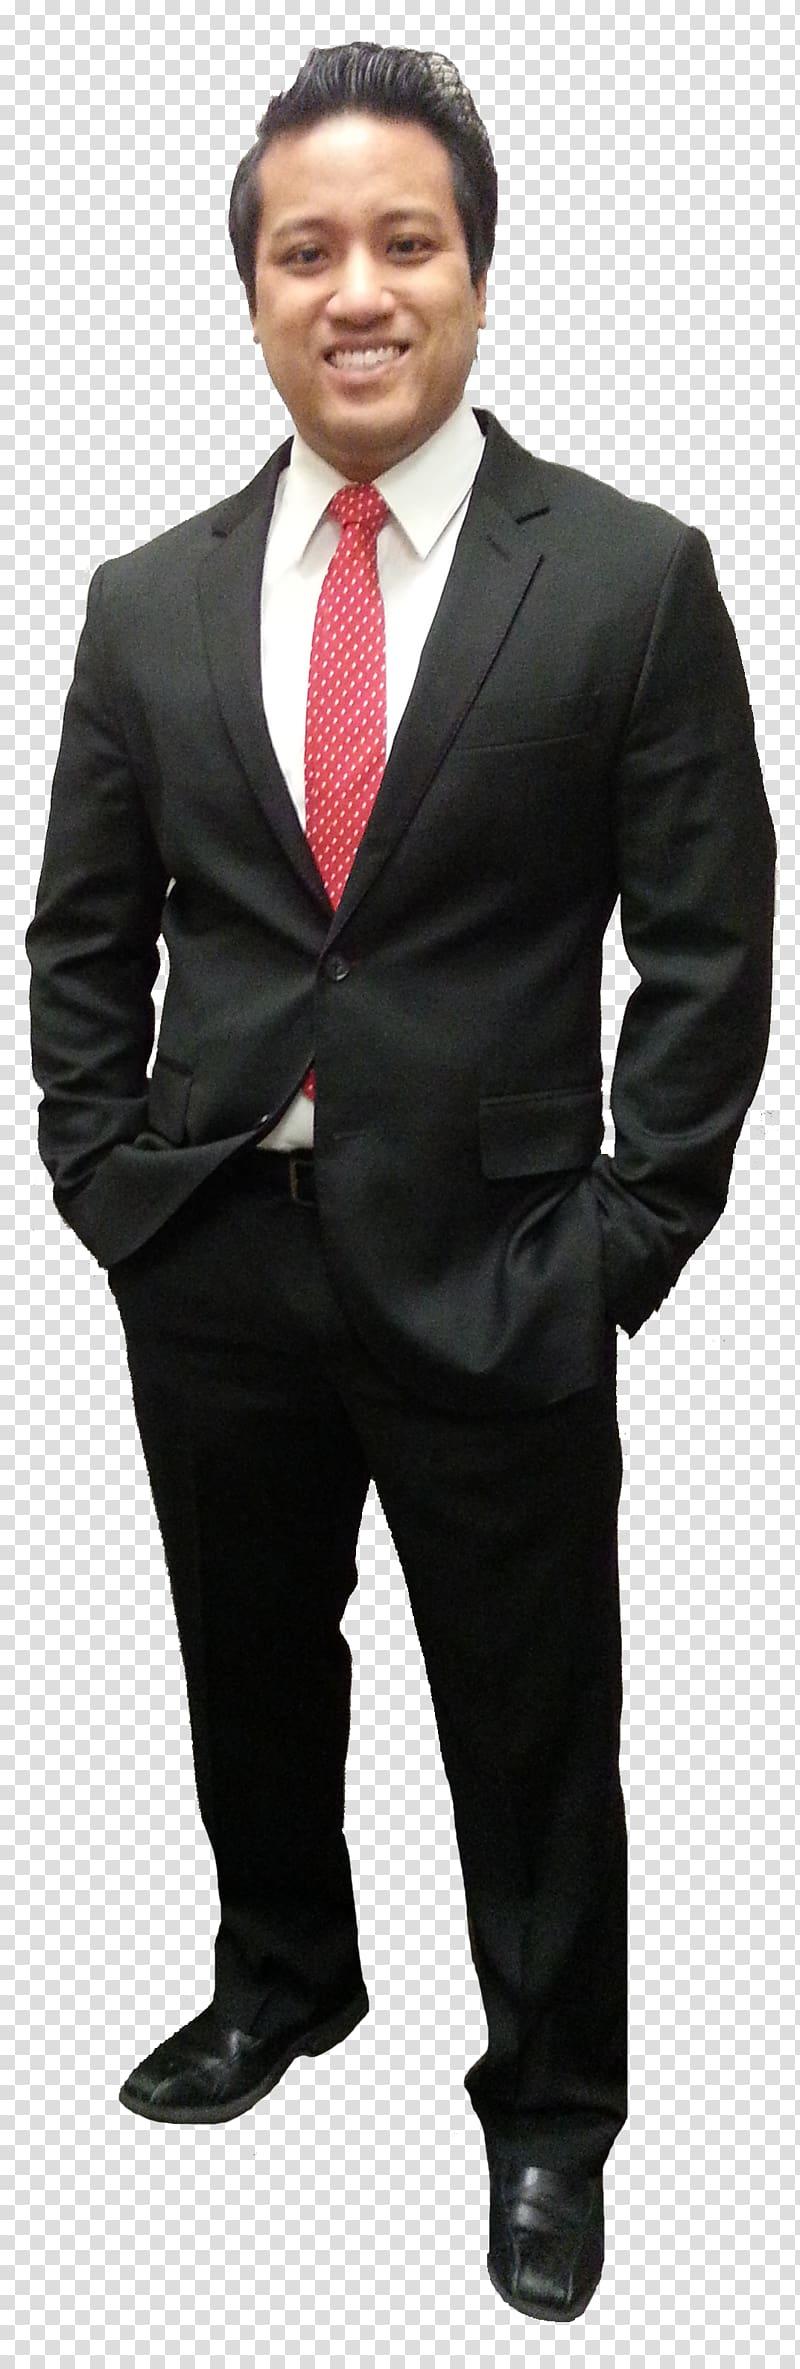 Amazon.com Clothing Tailor Tuxedo Costume, suit PNG